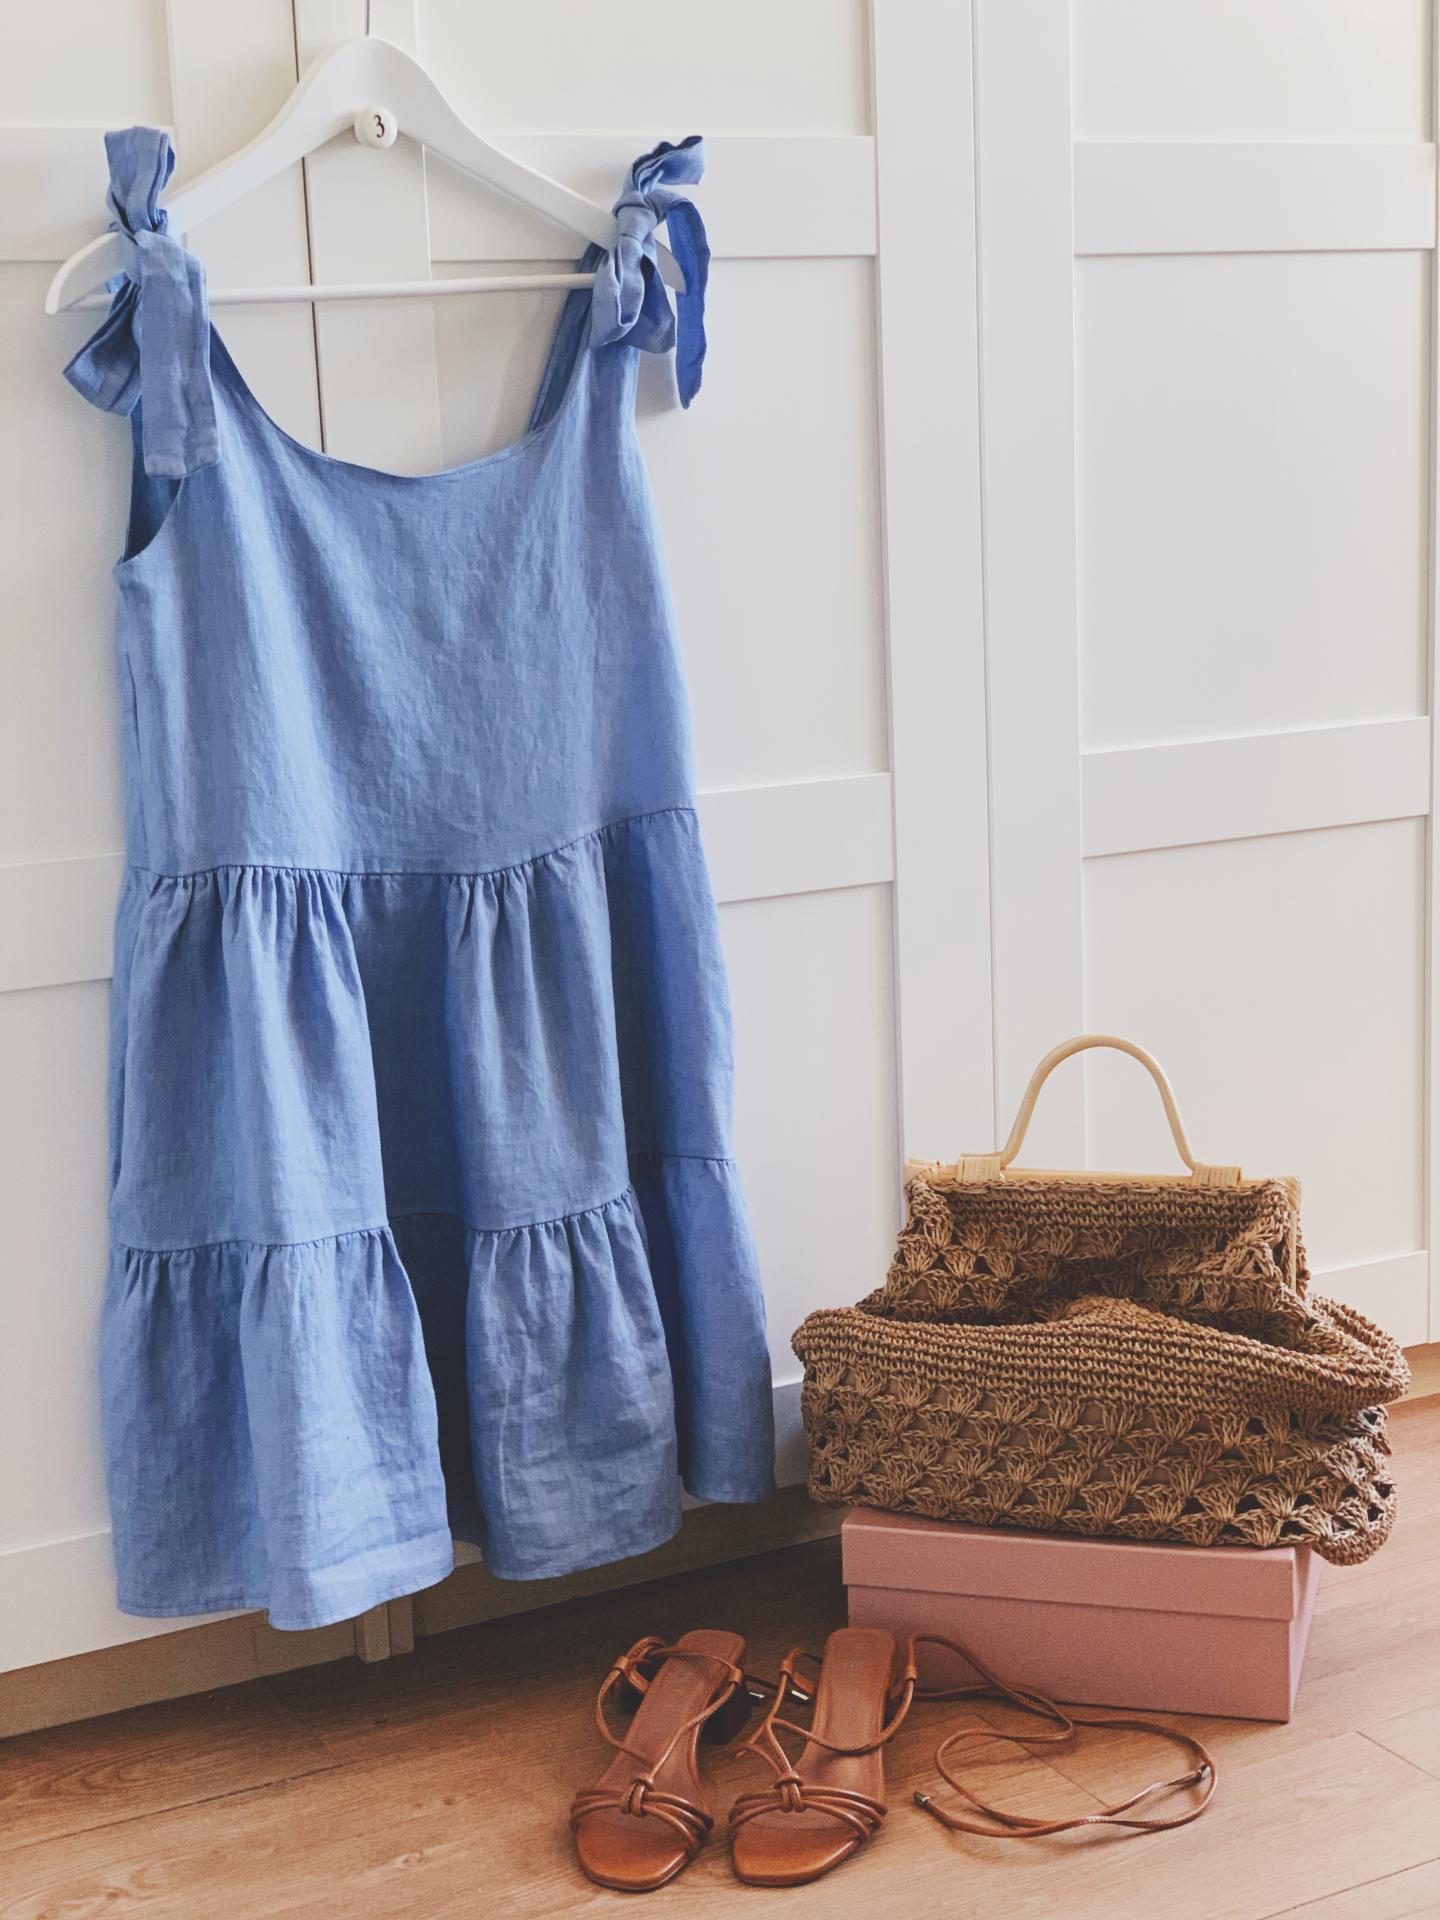 Vestido Linen Lazos (Ref.4087)